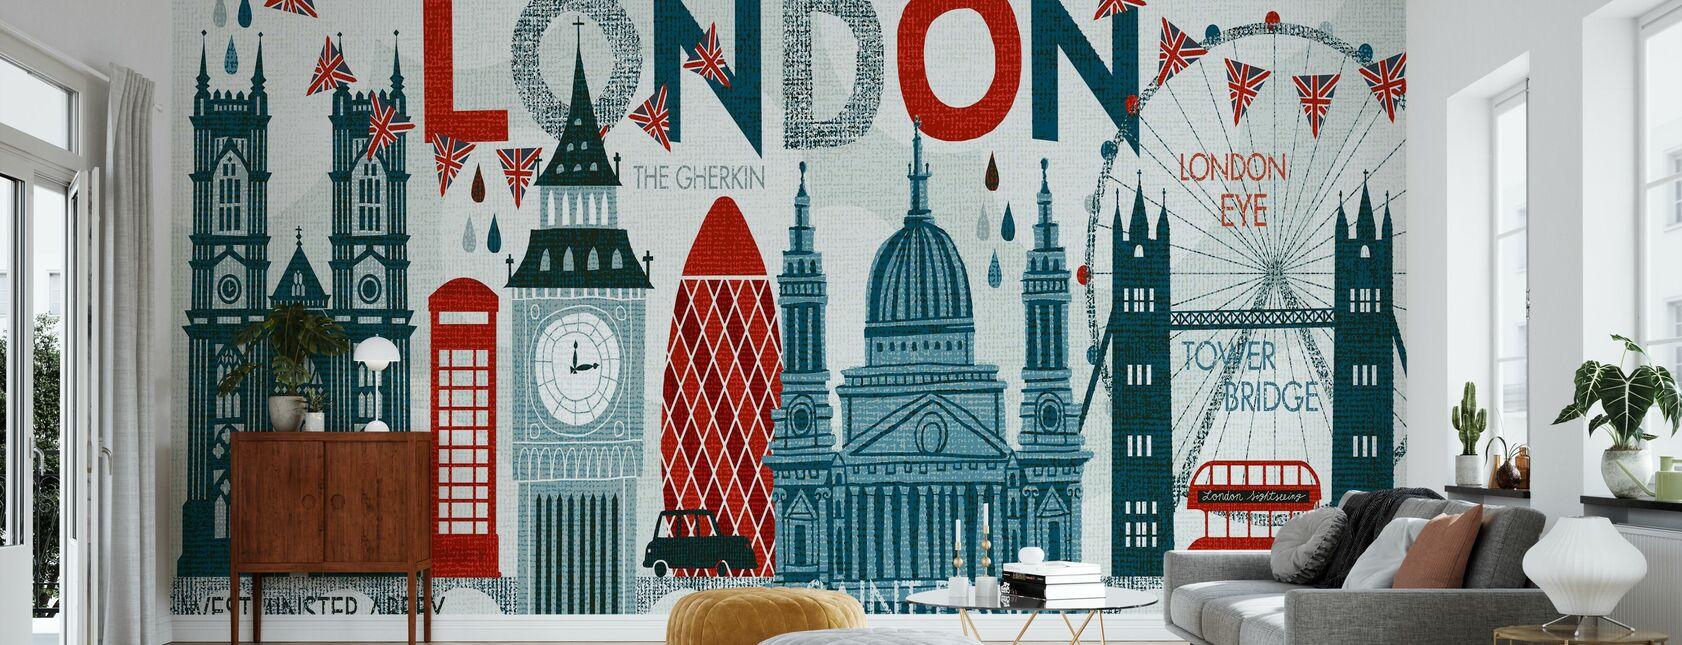 Hello London - Wallpaper - Living Room